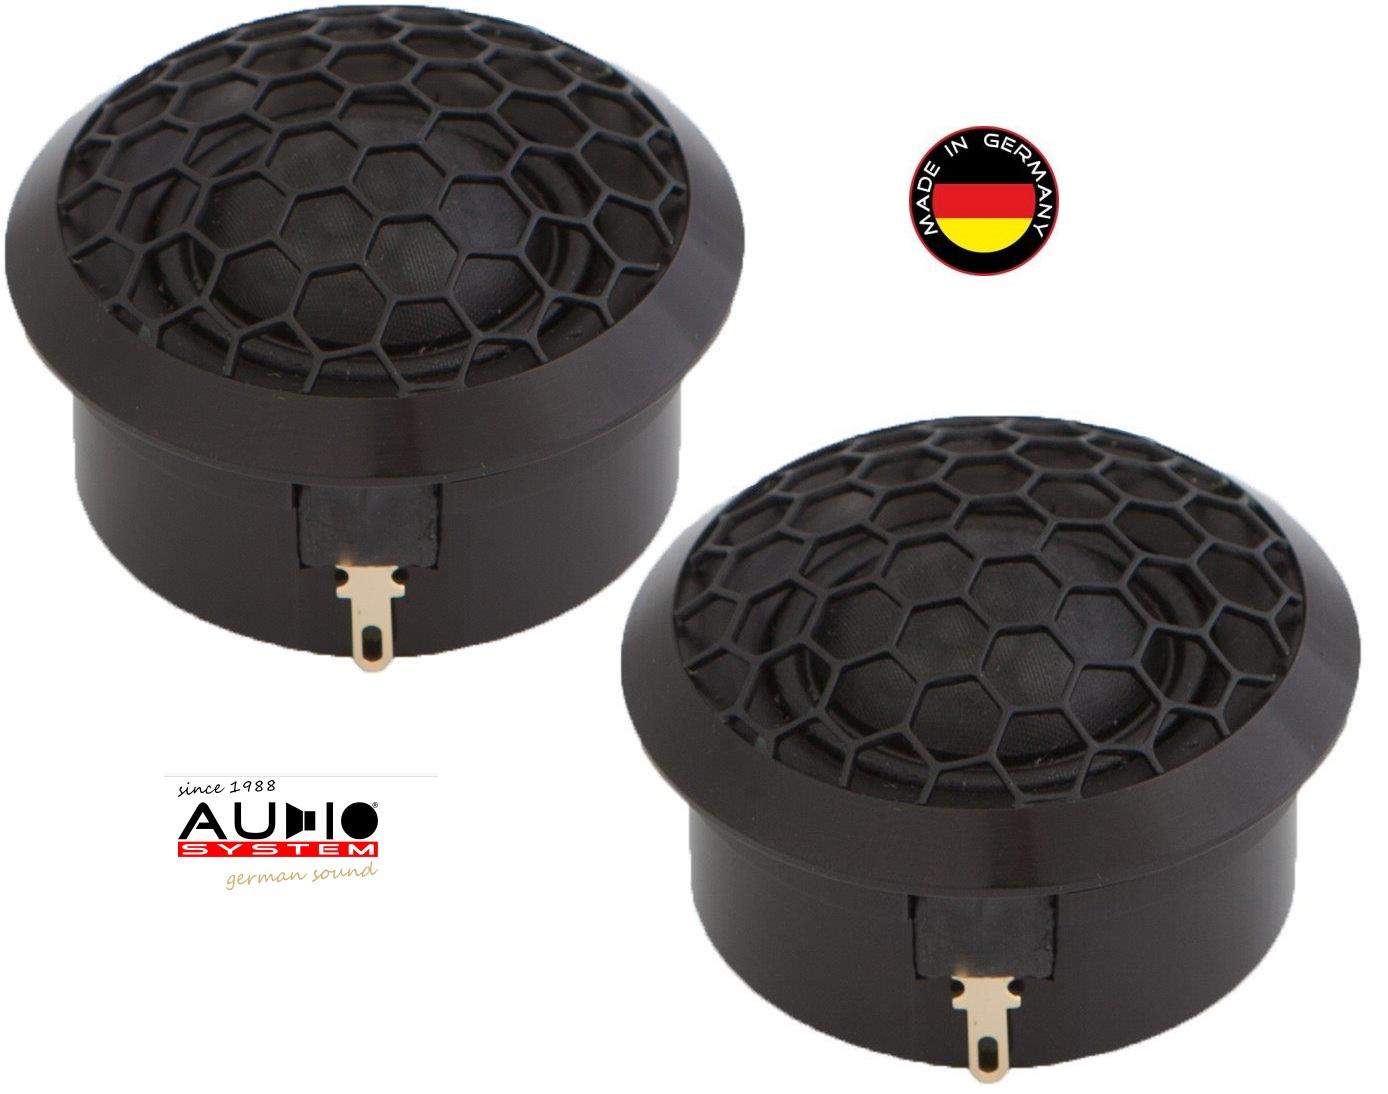 AUDIO SYSTEM AV 26 AVALANCHE-SERIES 26 mm ABSOLUTE HIGH-END Hochtöner mit Neodymantrieb 1 Paar 100 Watt